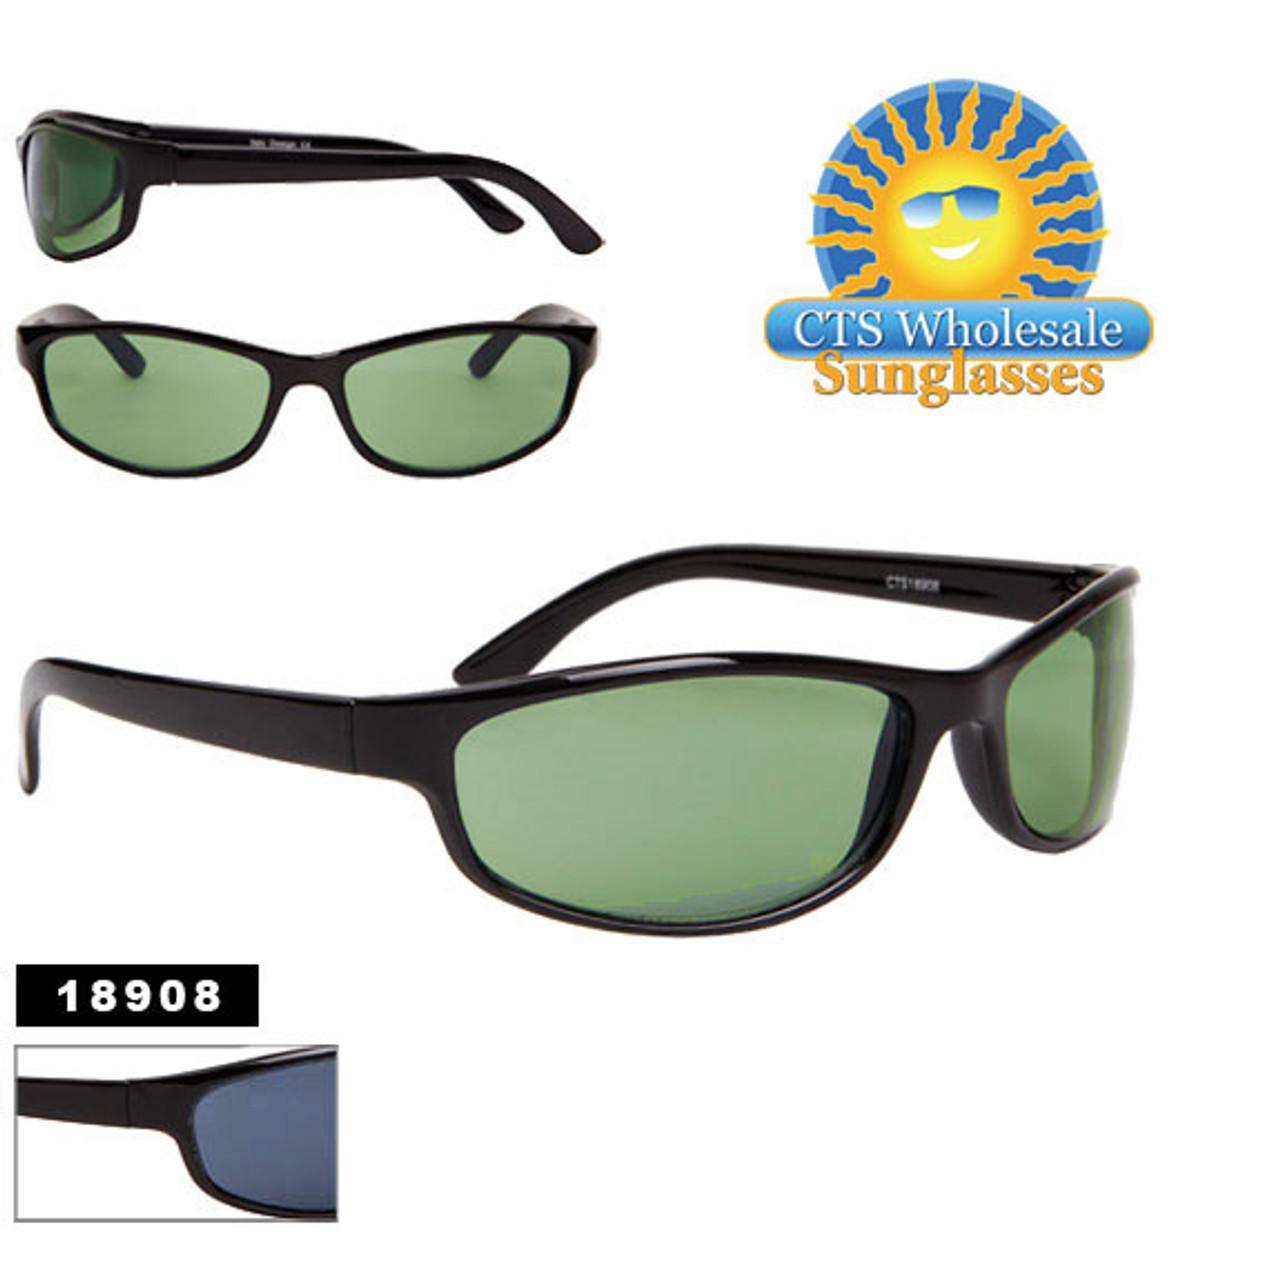 Cheap Wholesale Sunglasses 18908